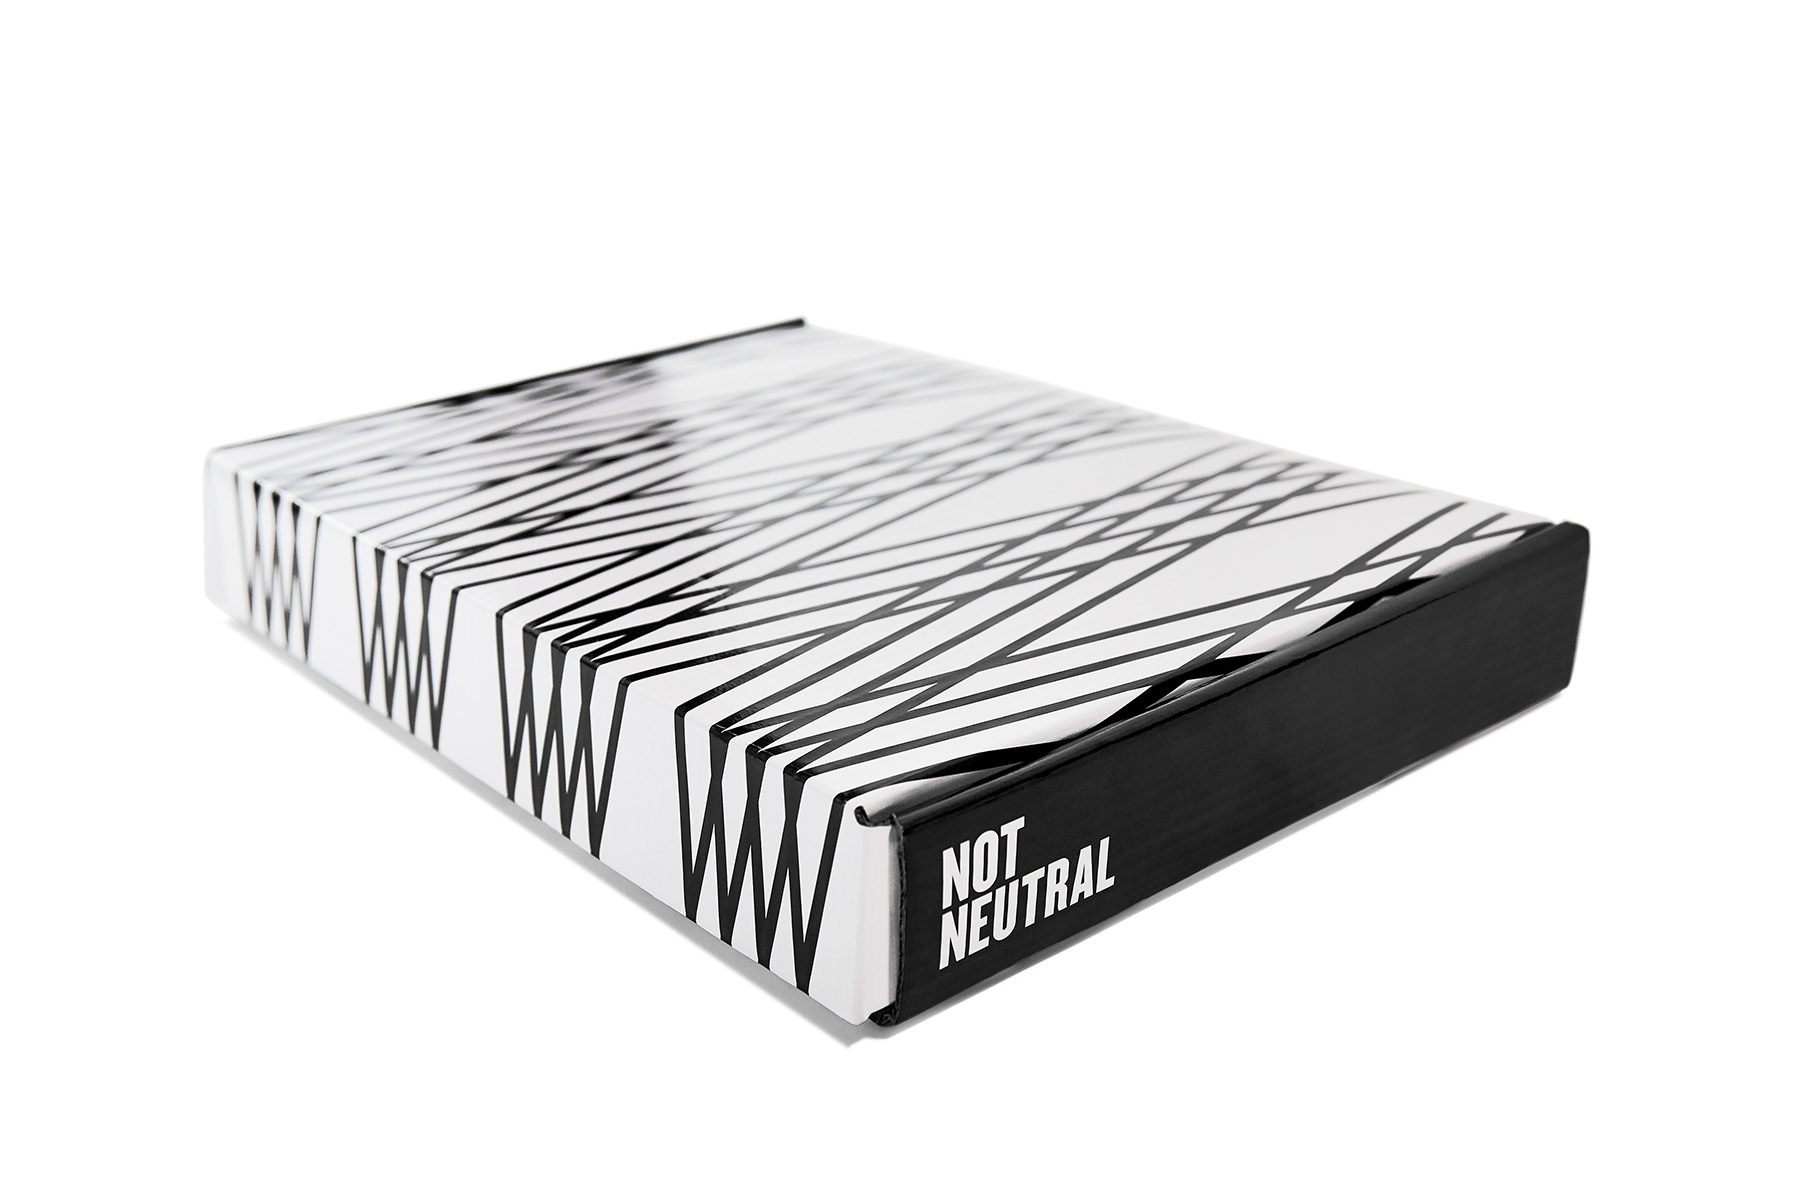 A_Not Neutral Book_Carlos Alexander_Box Title Side Zoom_1800.jpg